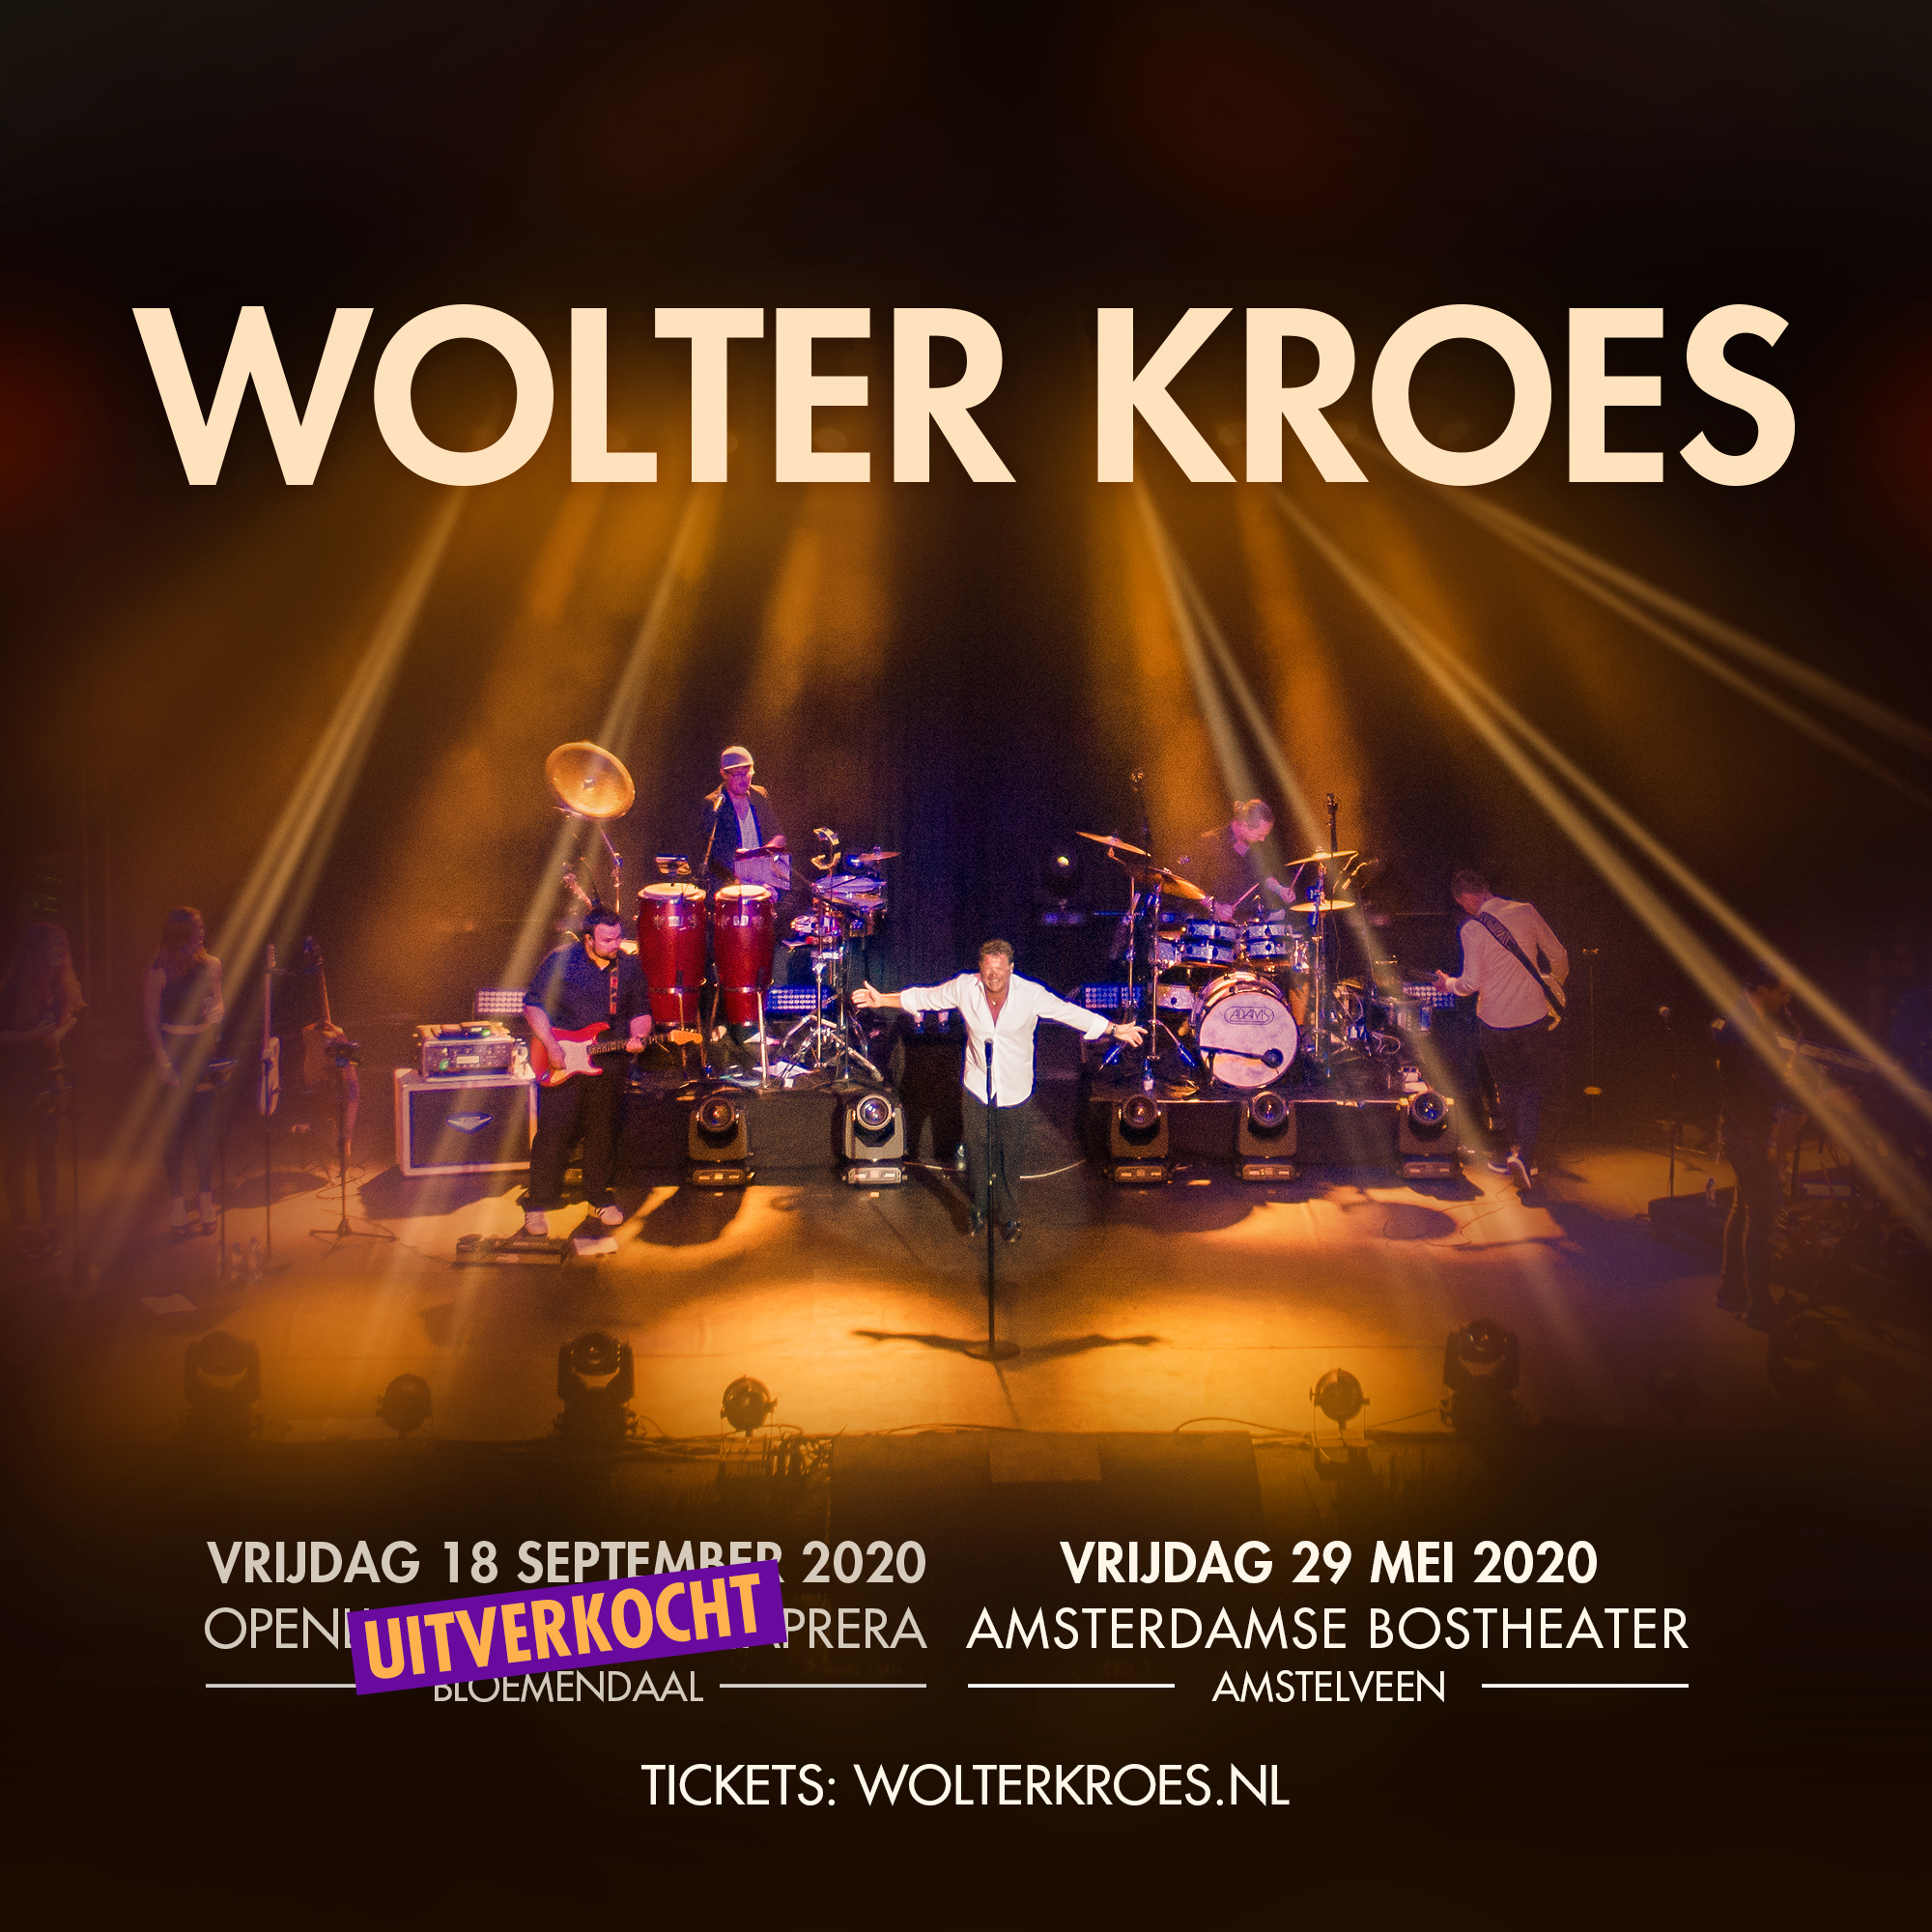 https://caprera.nu/agenda/wolter-kroes/